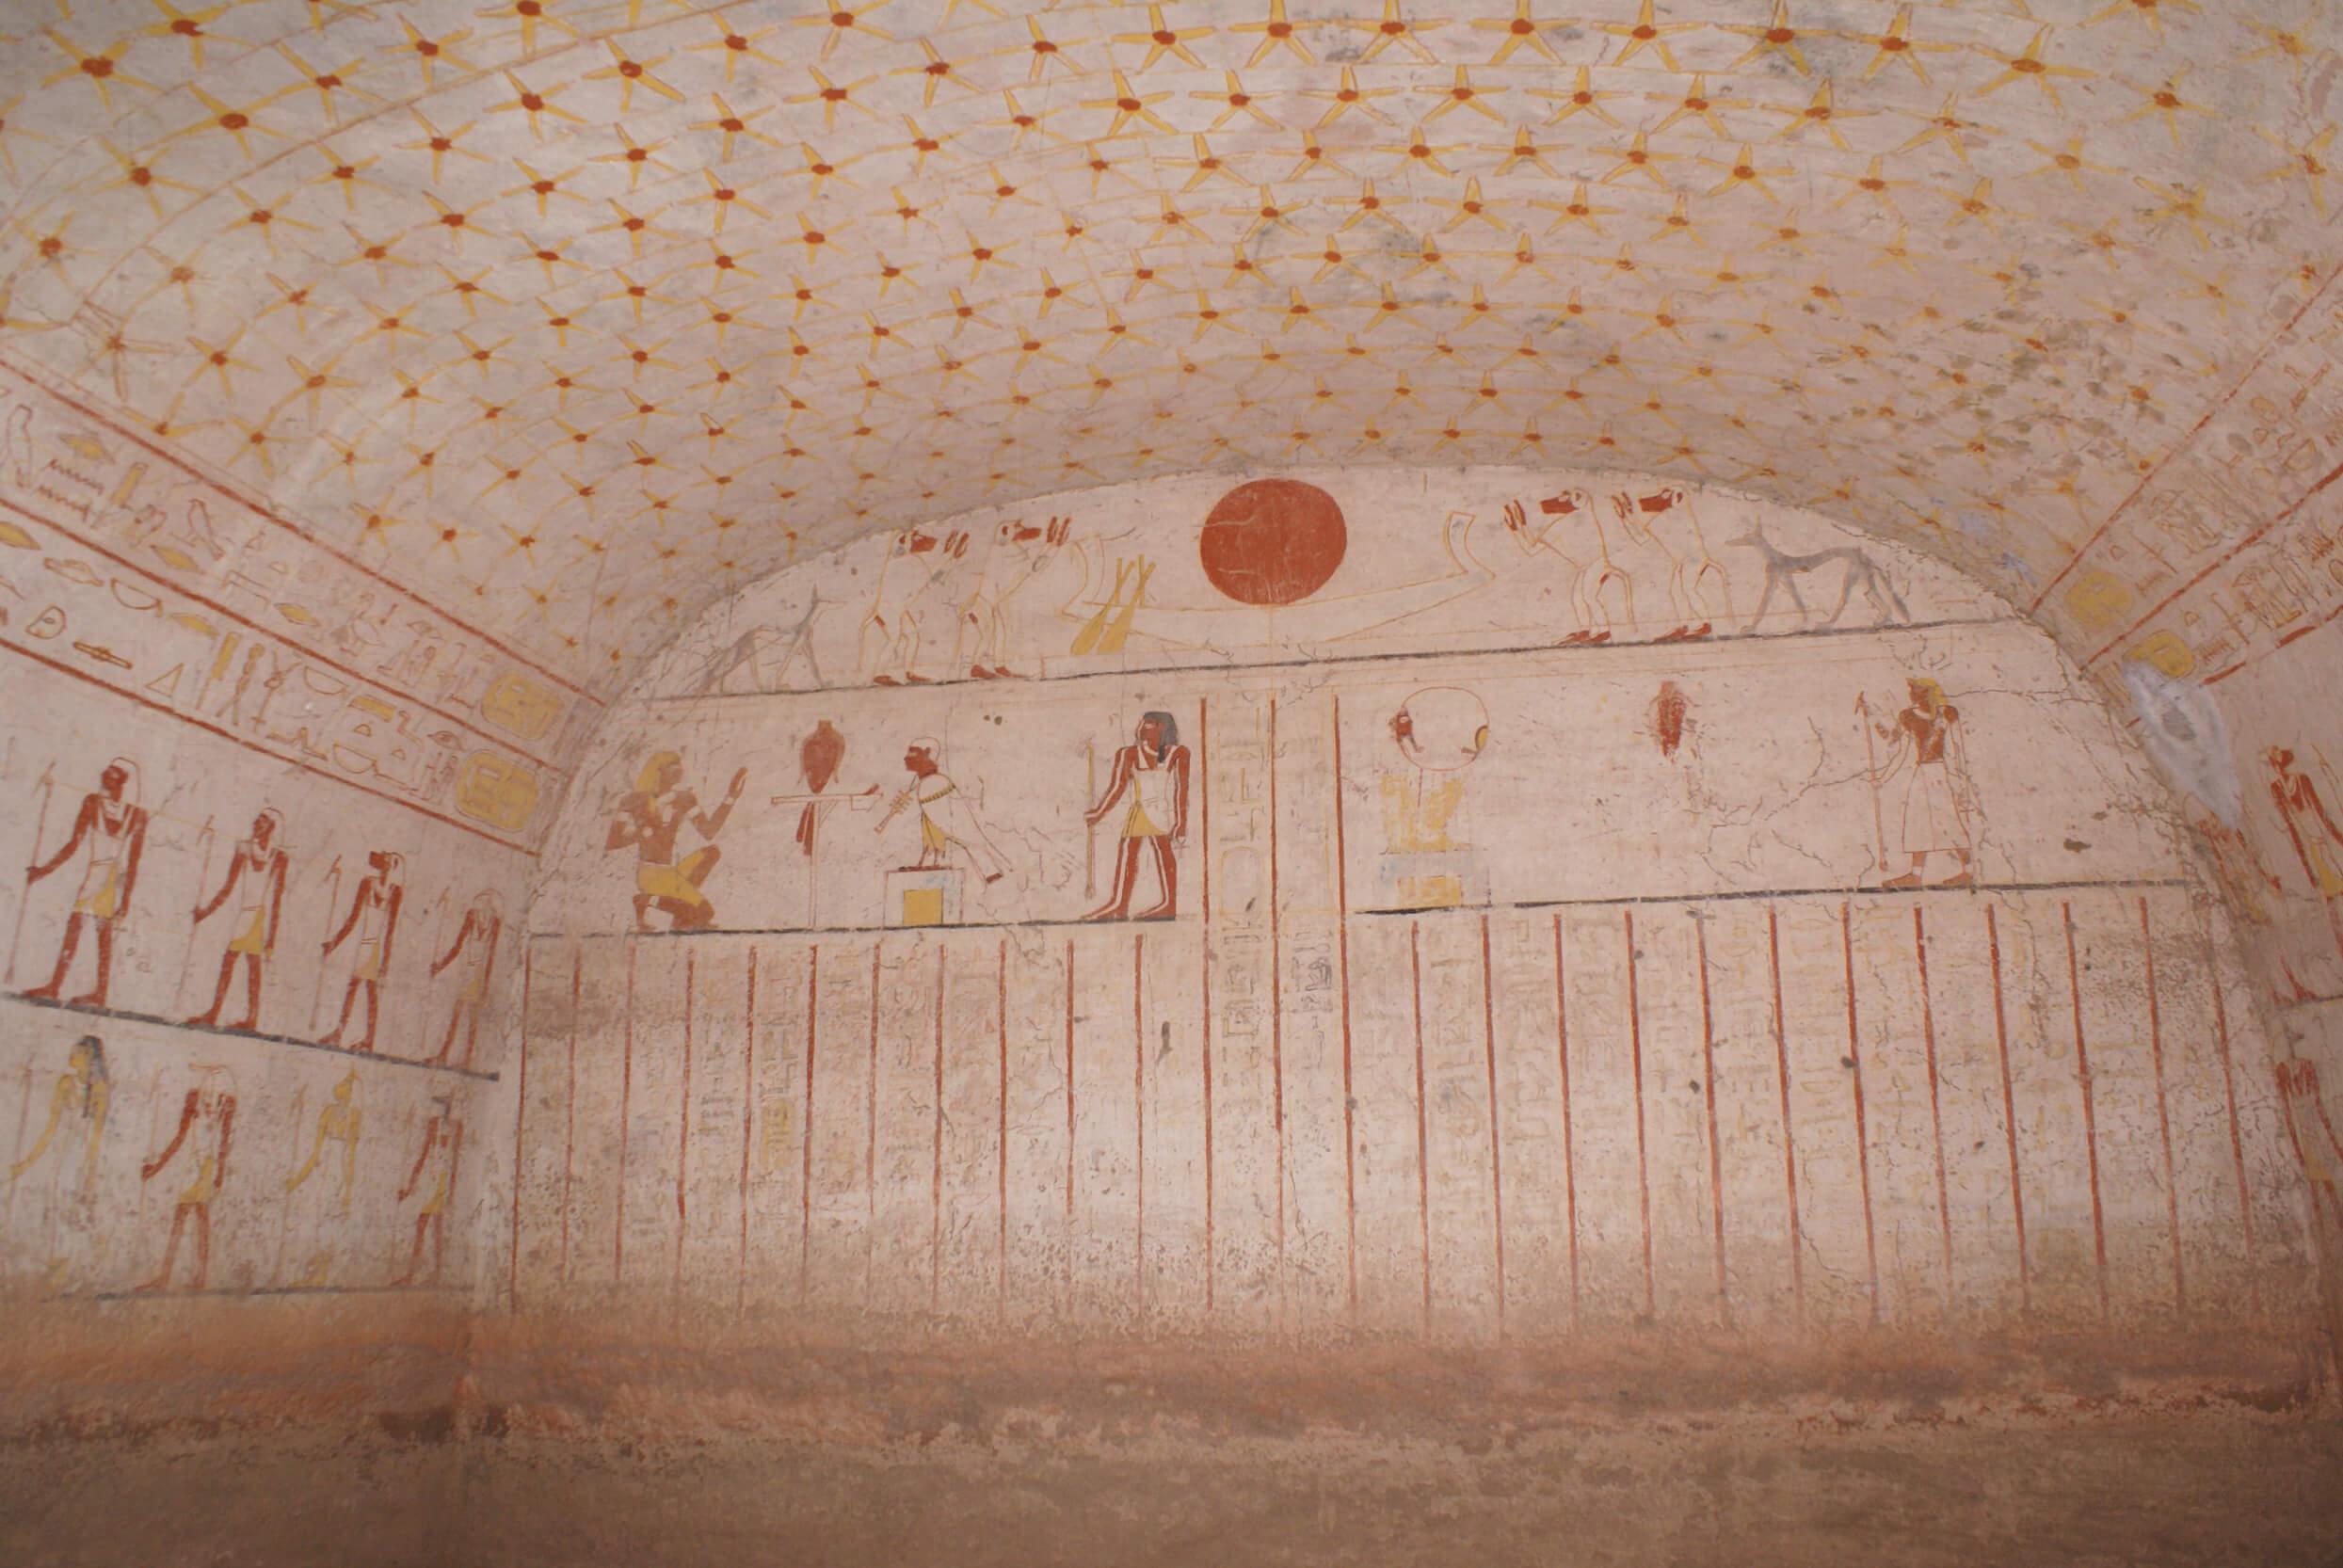 https://bubo.sk/uploads/galleries/7407/lubosfellner_sudan_6a-vnutro-pyramidy-a-ziadni-ini-turisti.jpg